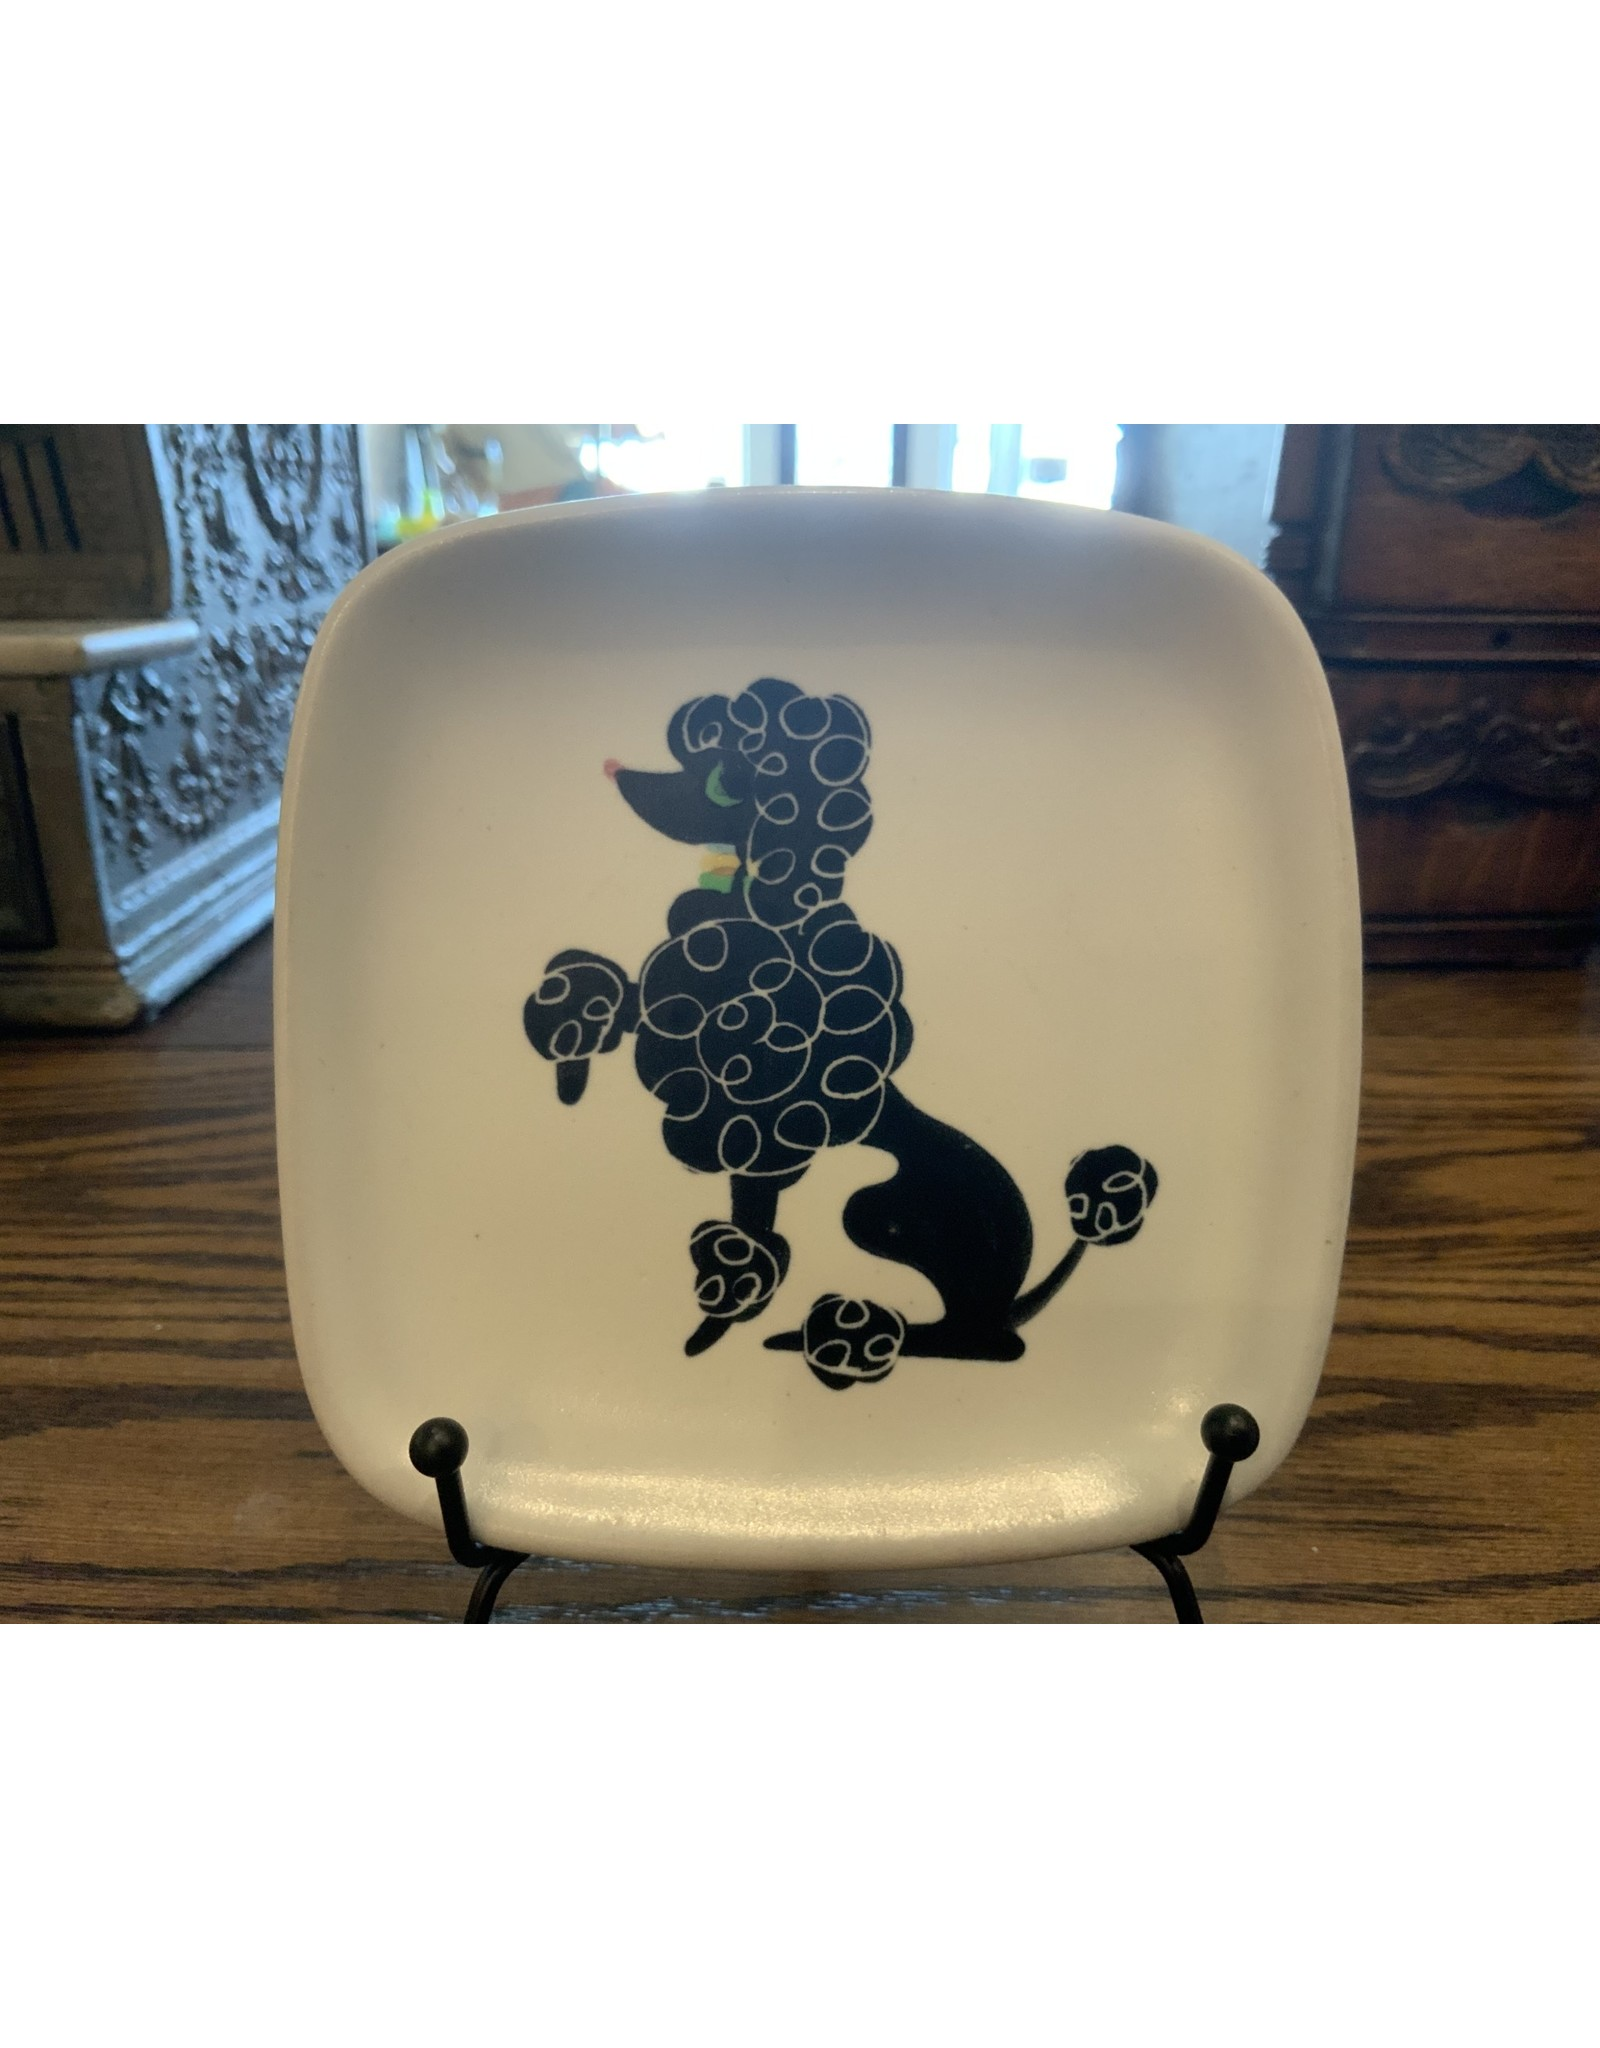 SPV Mid-Century Modern Glidden Poodle Plates and 3-part hors d'oeuvre platter set